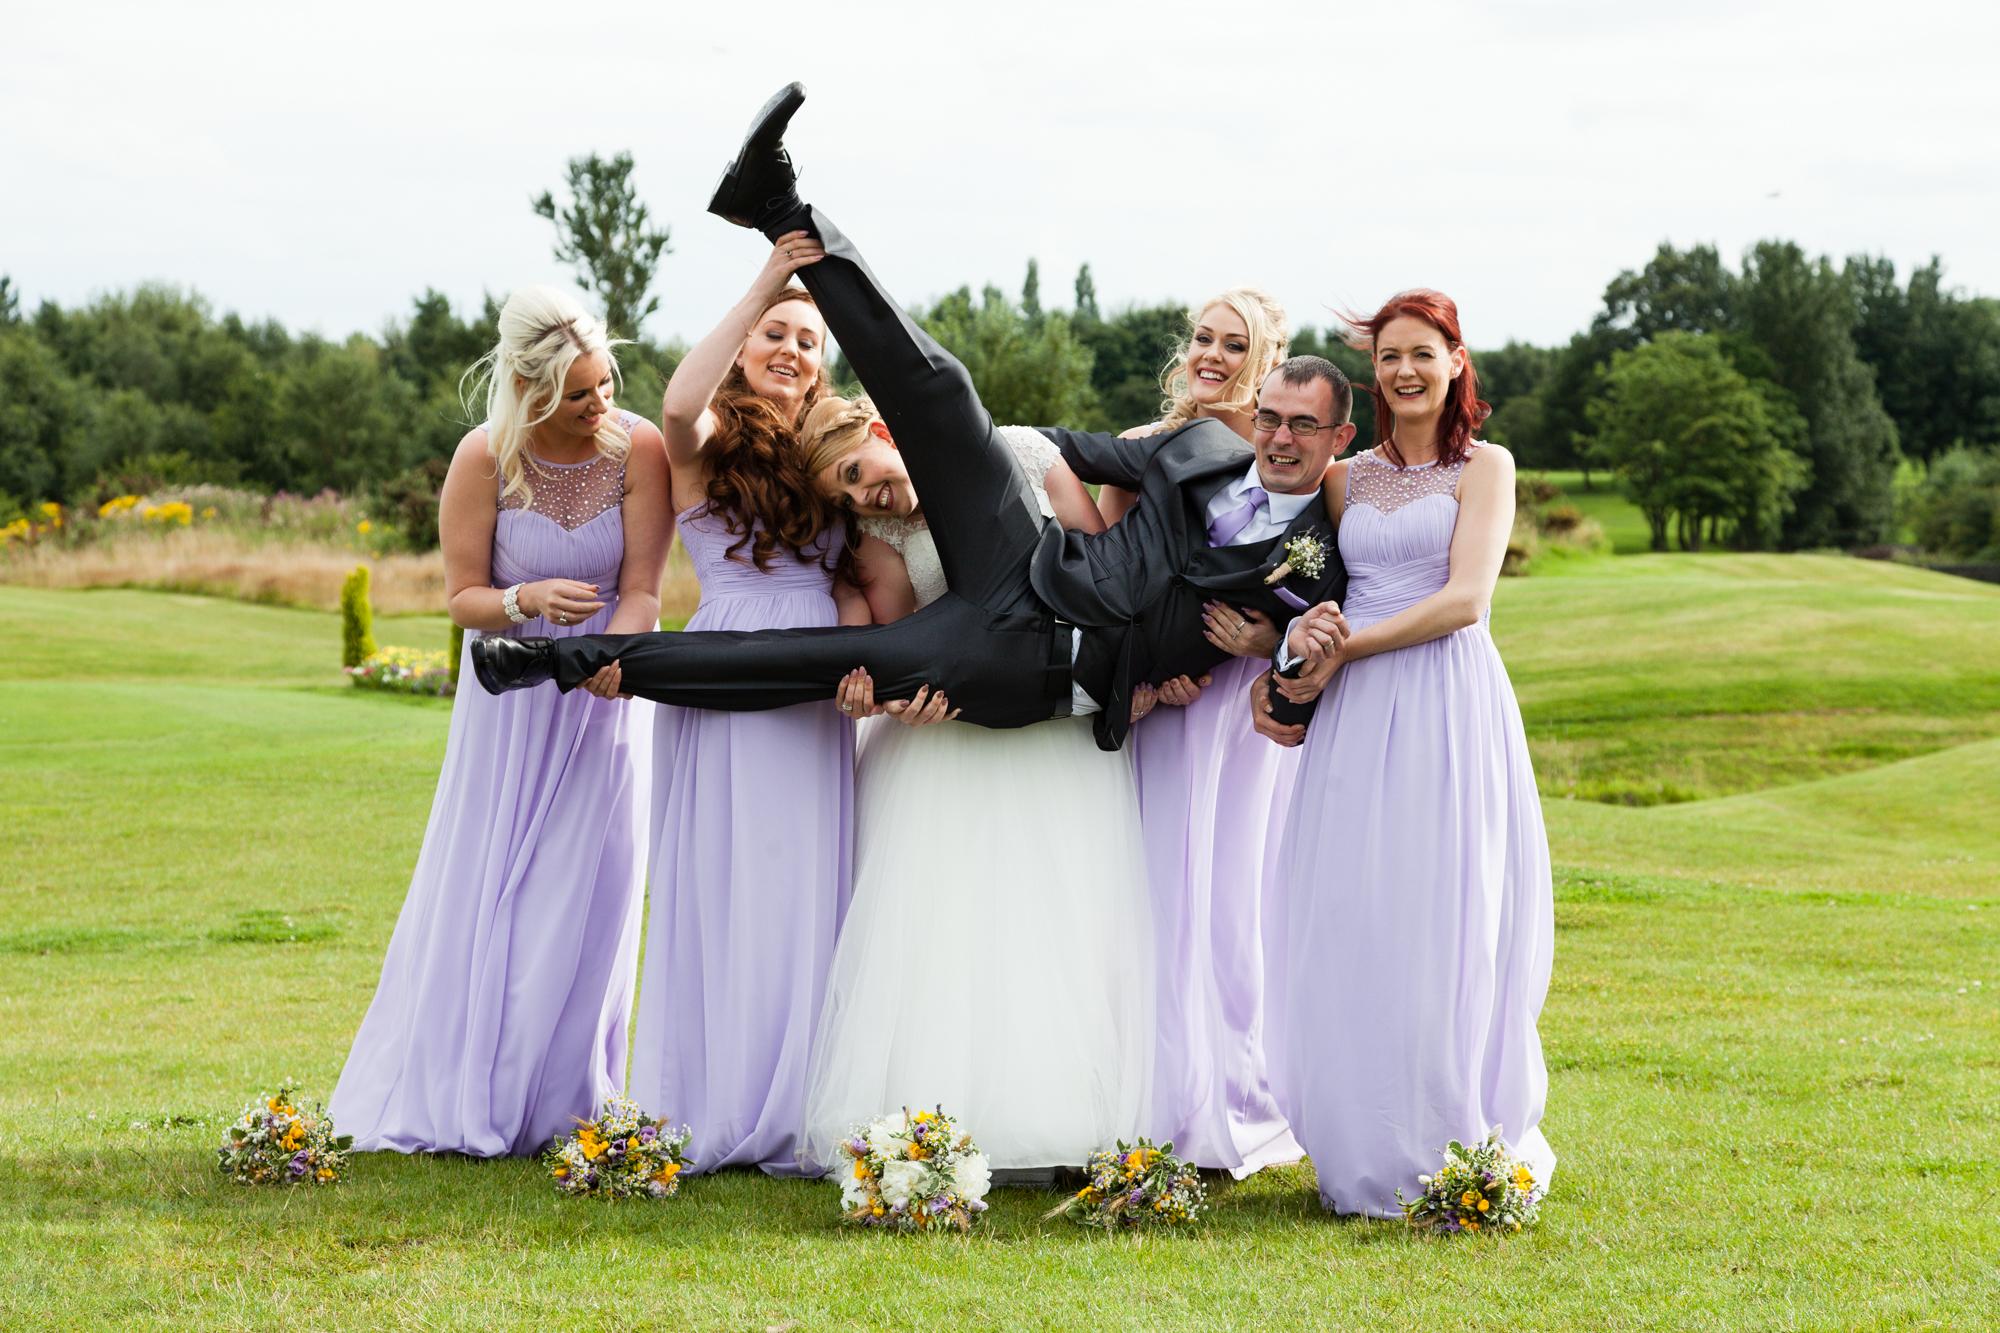 Bride, Groom and Bridesmaids at a wedding.